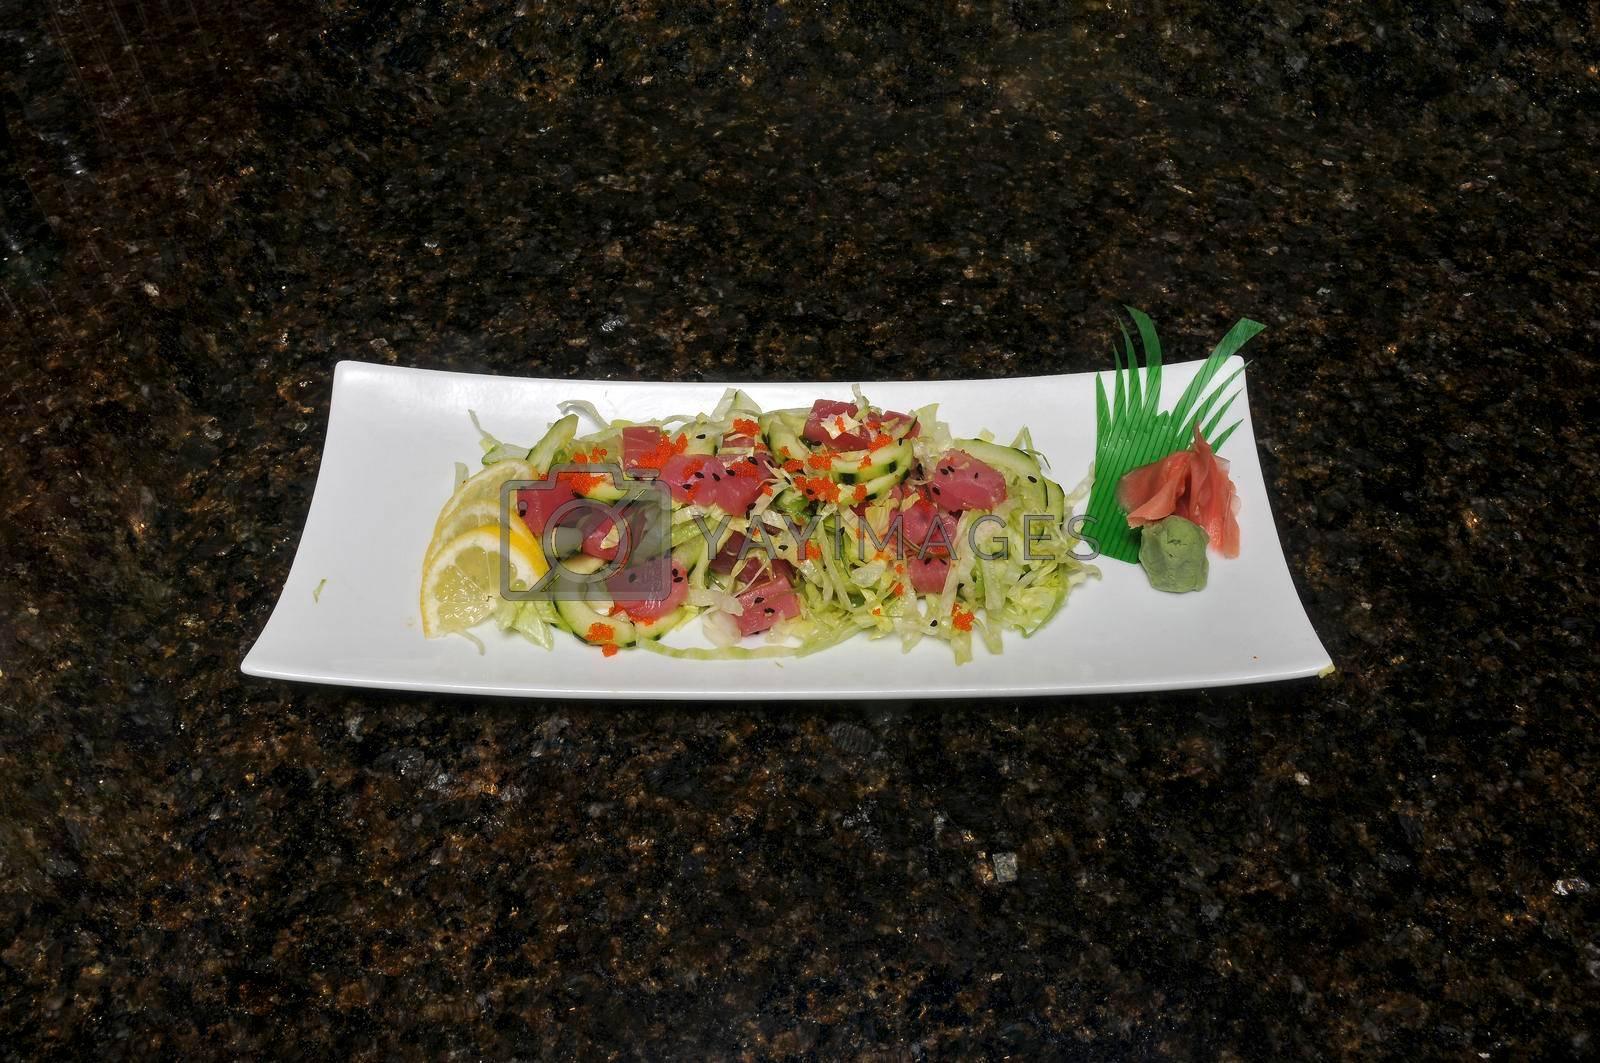 Delicious Asian cuisine known as ponzu salmon salad